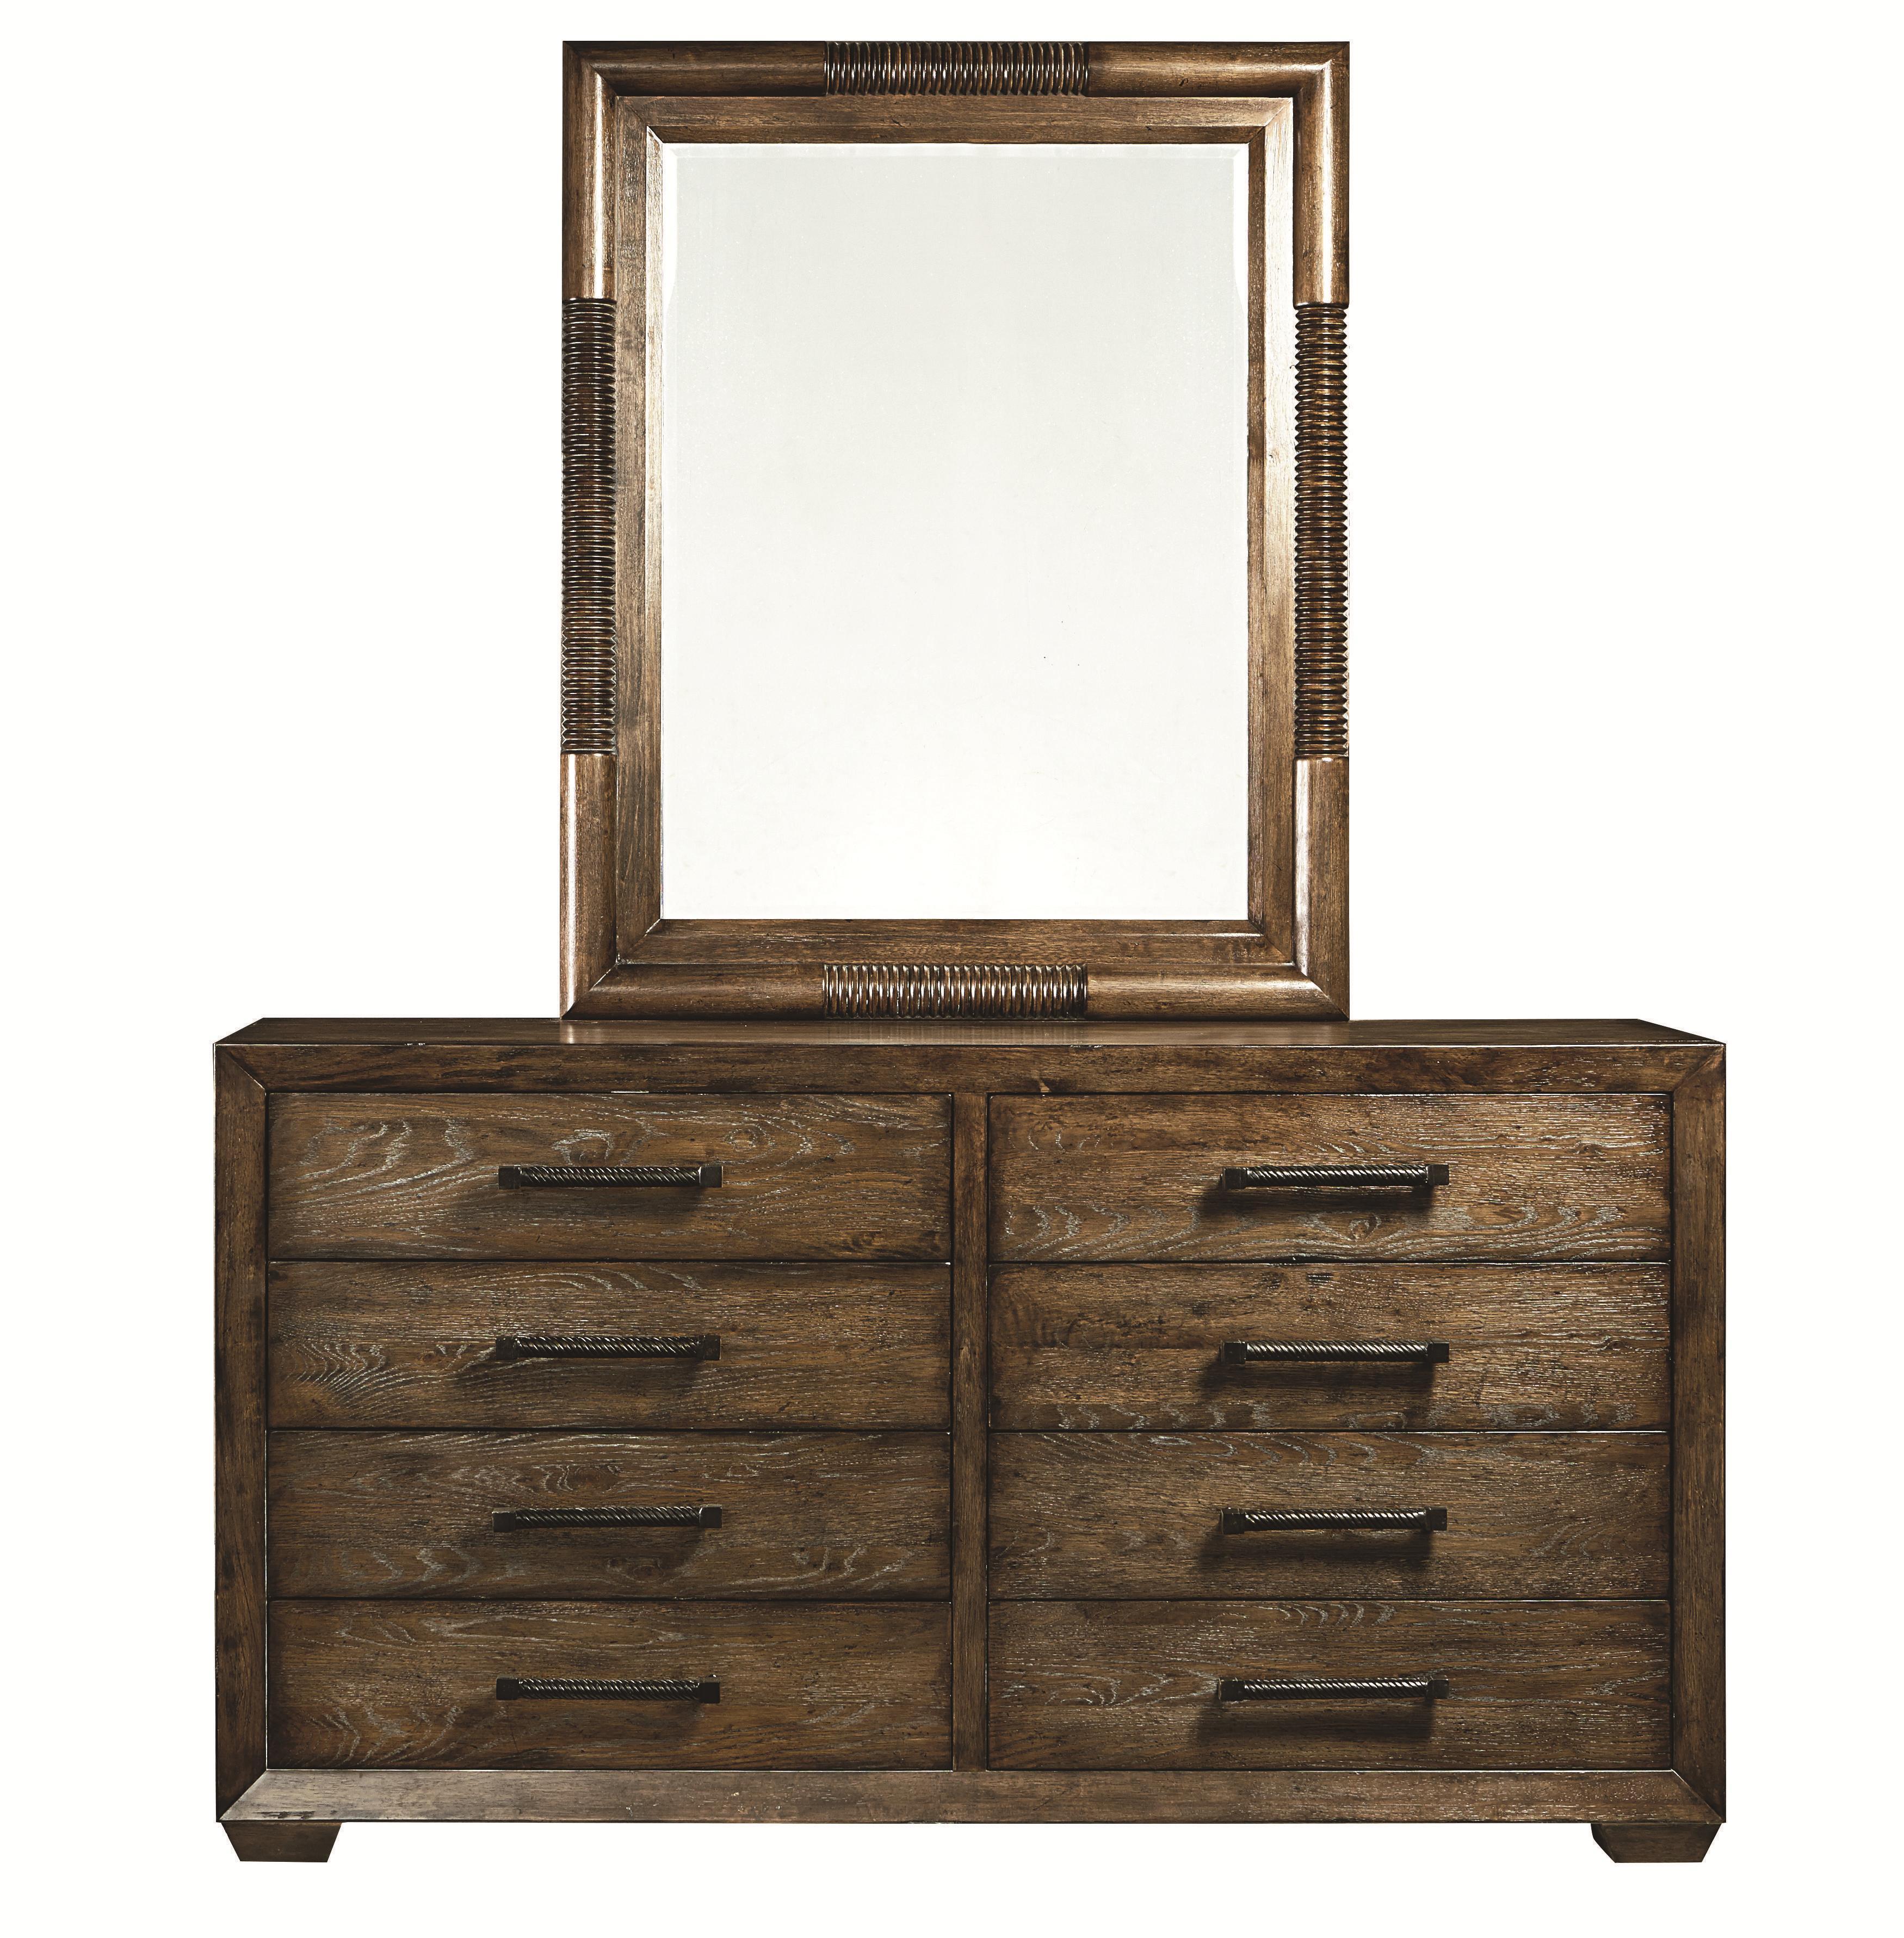 Bassett Compass Dresser and Mirror Combo - Item Number: 2525-0237+0242